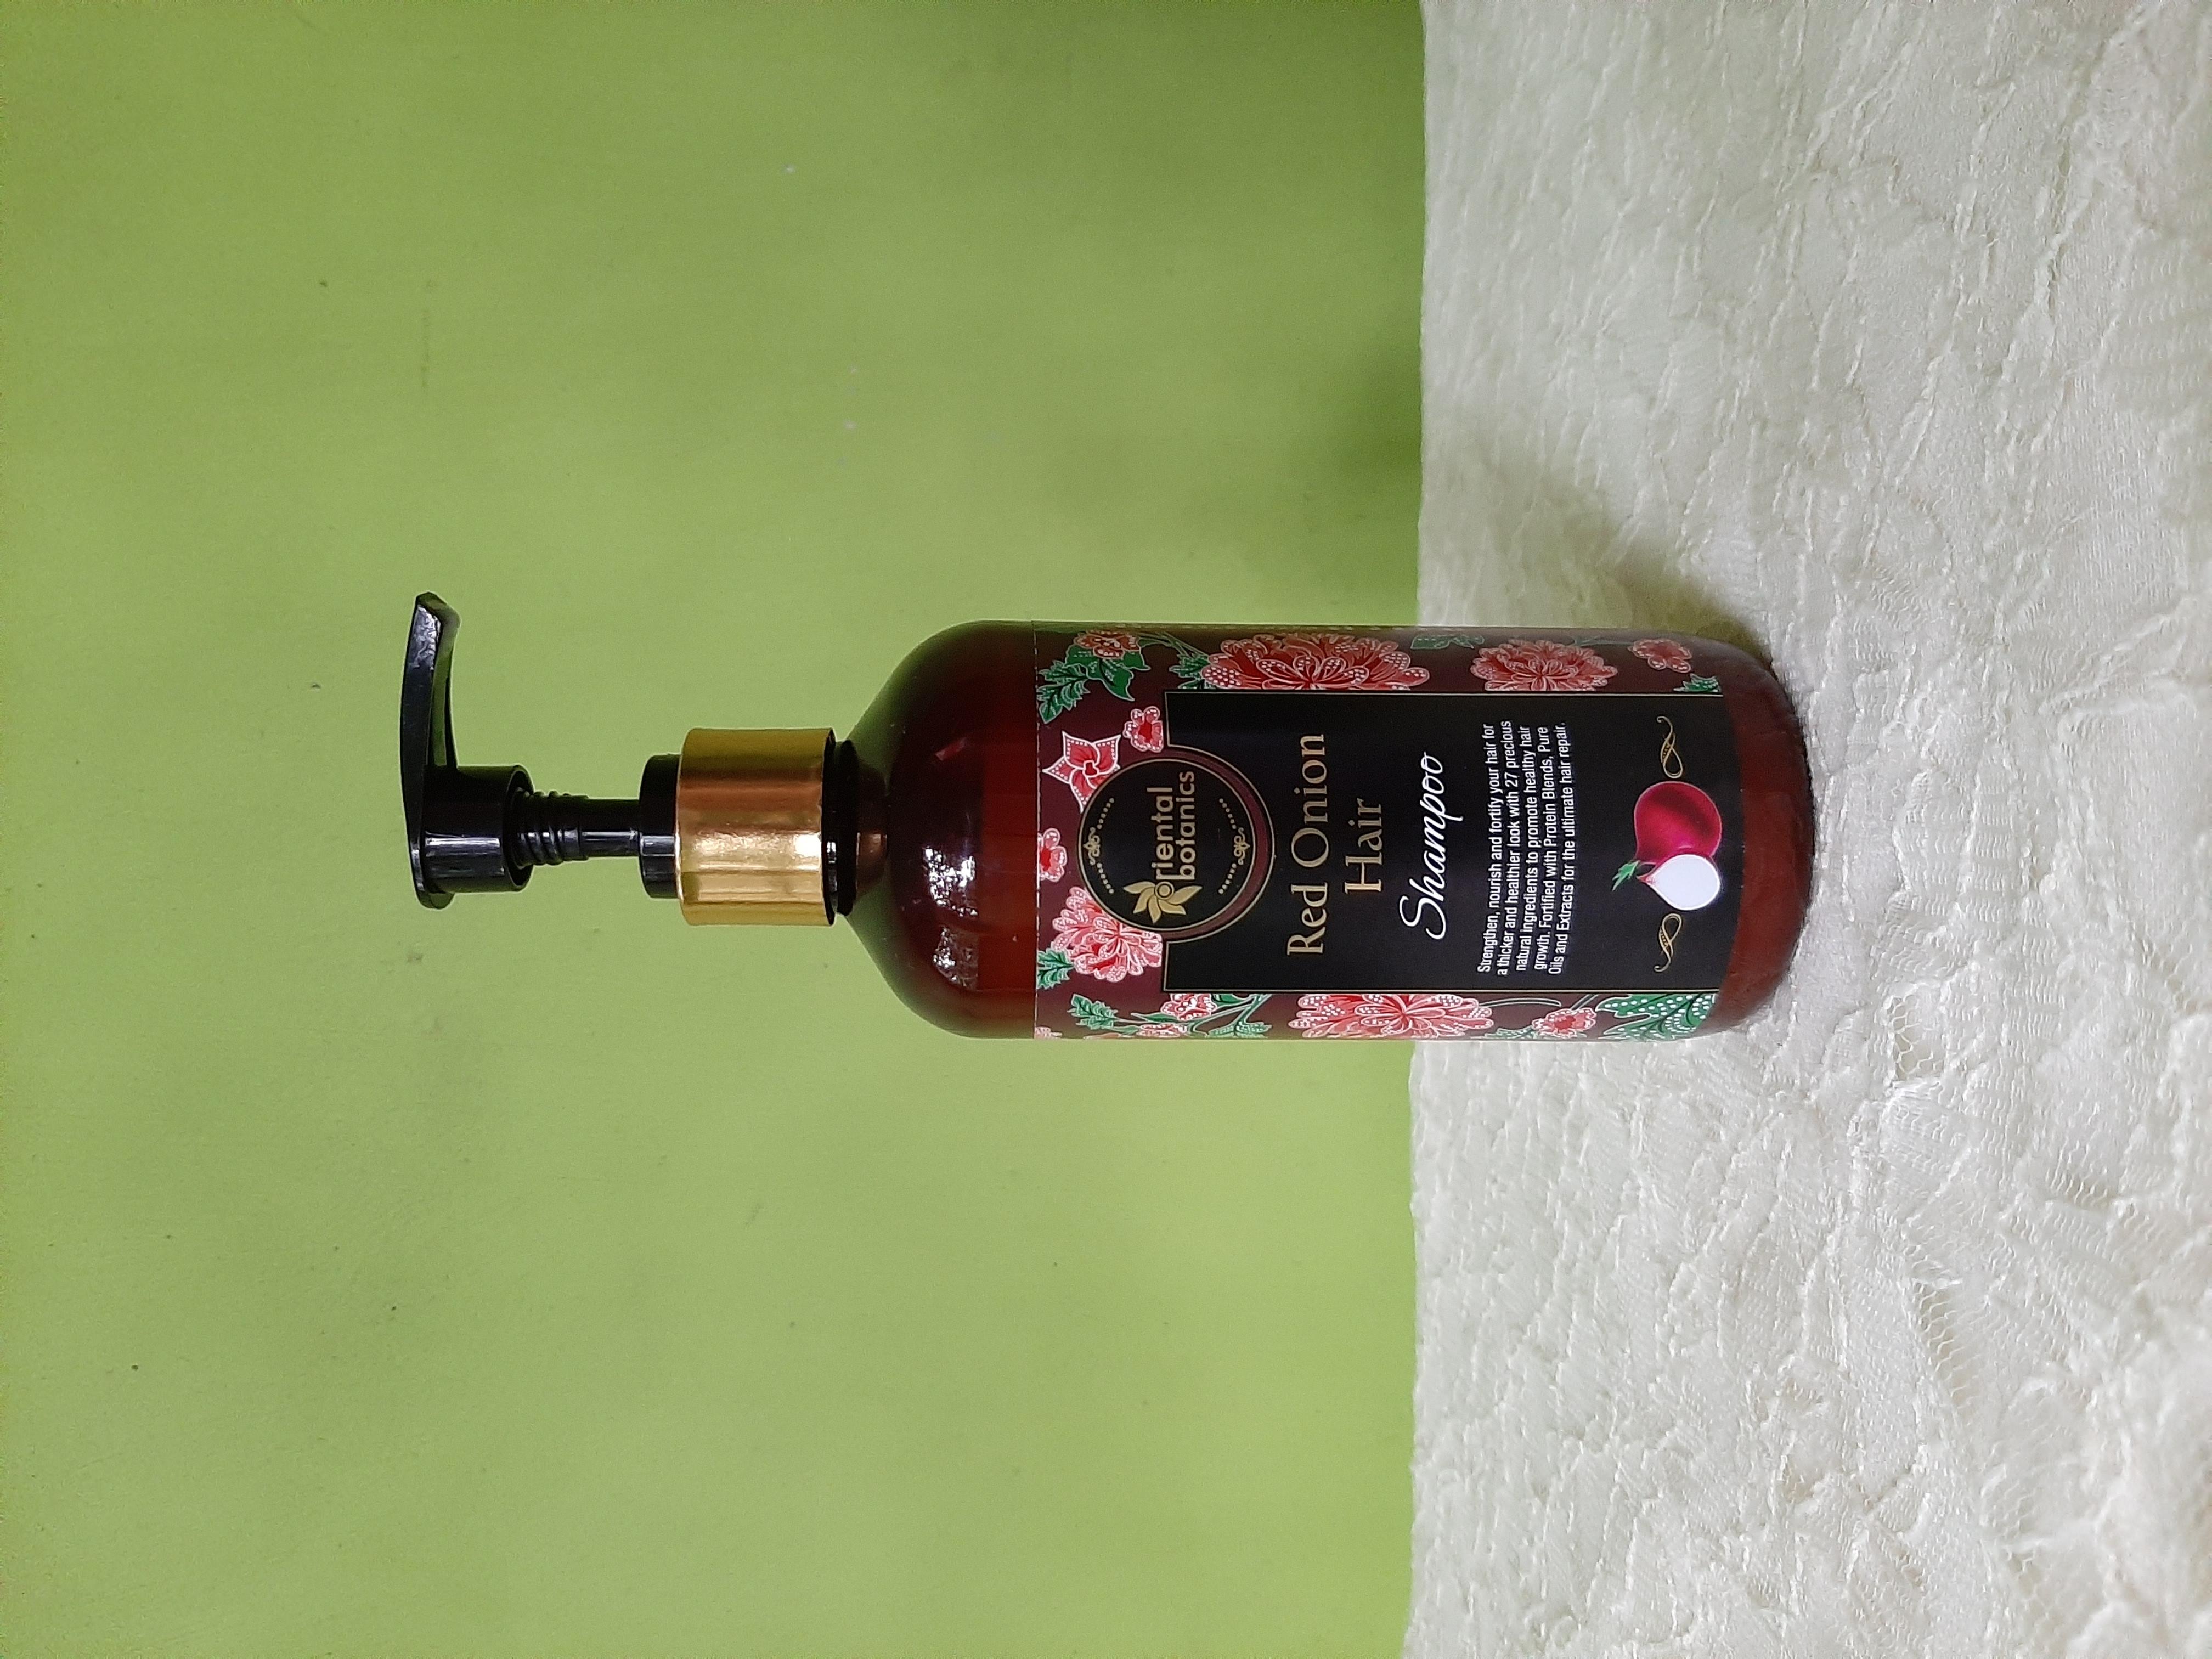 Oriental Botanics Red Onion Hair Shampoo-Great Affordable shampoo-By basictobling-3